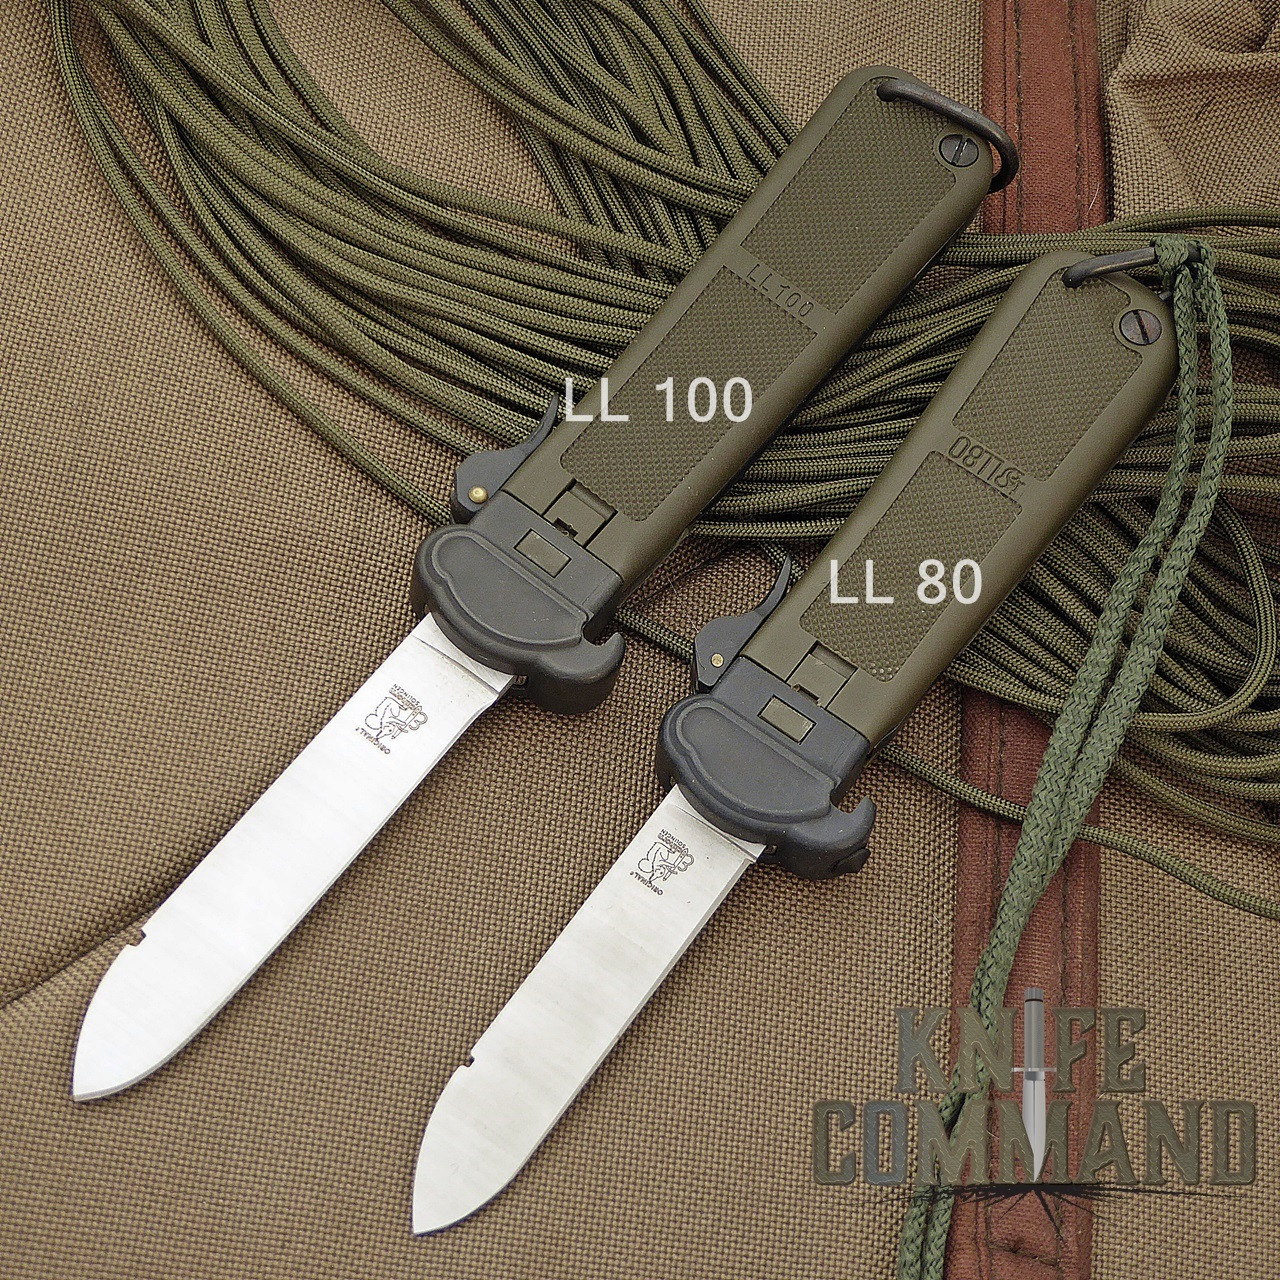 Eickhorn Solingen LL 80 Paratrooper Knife